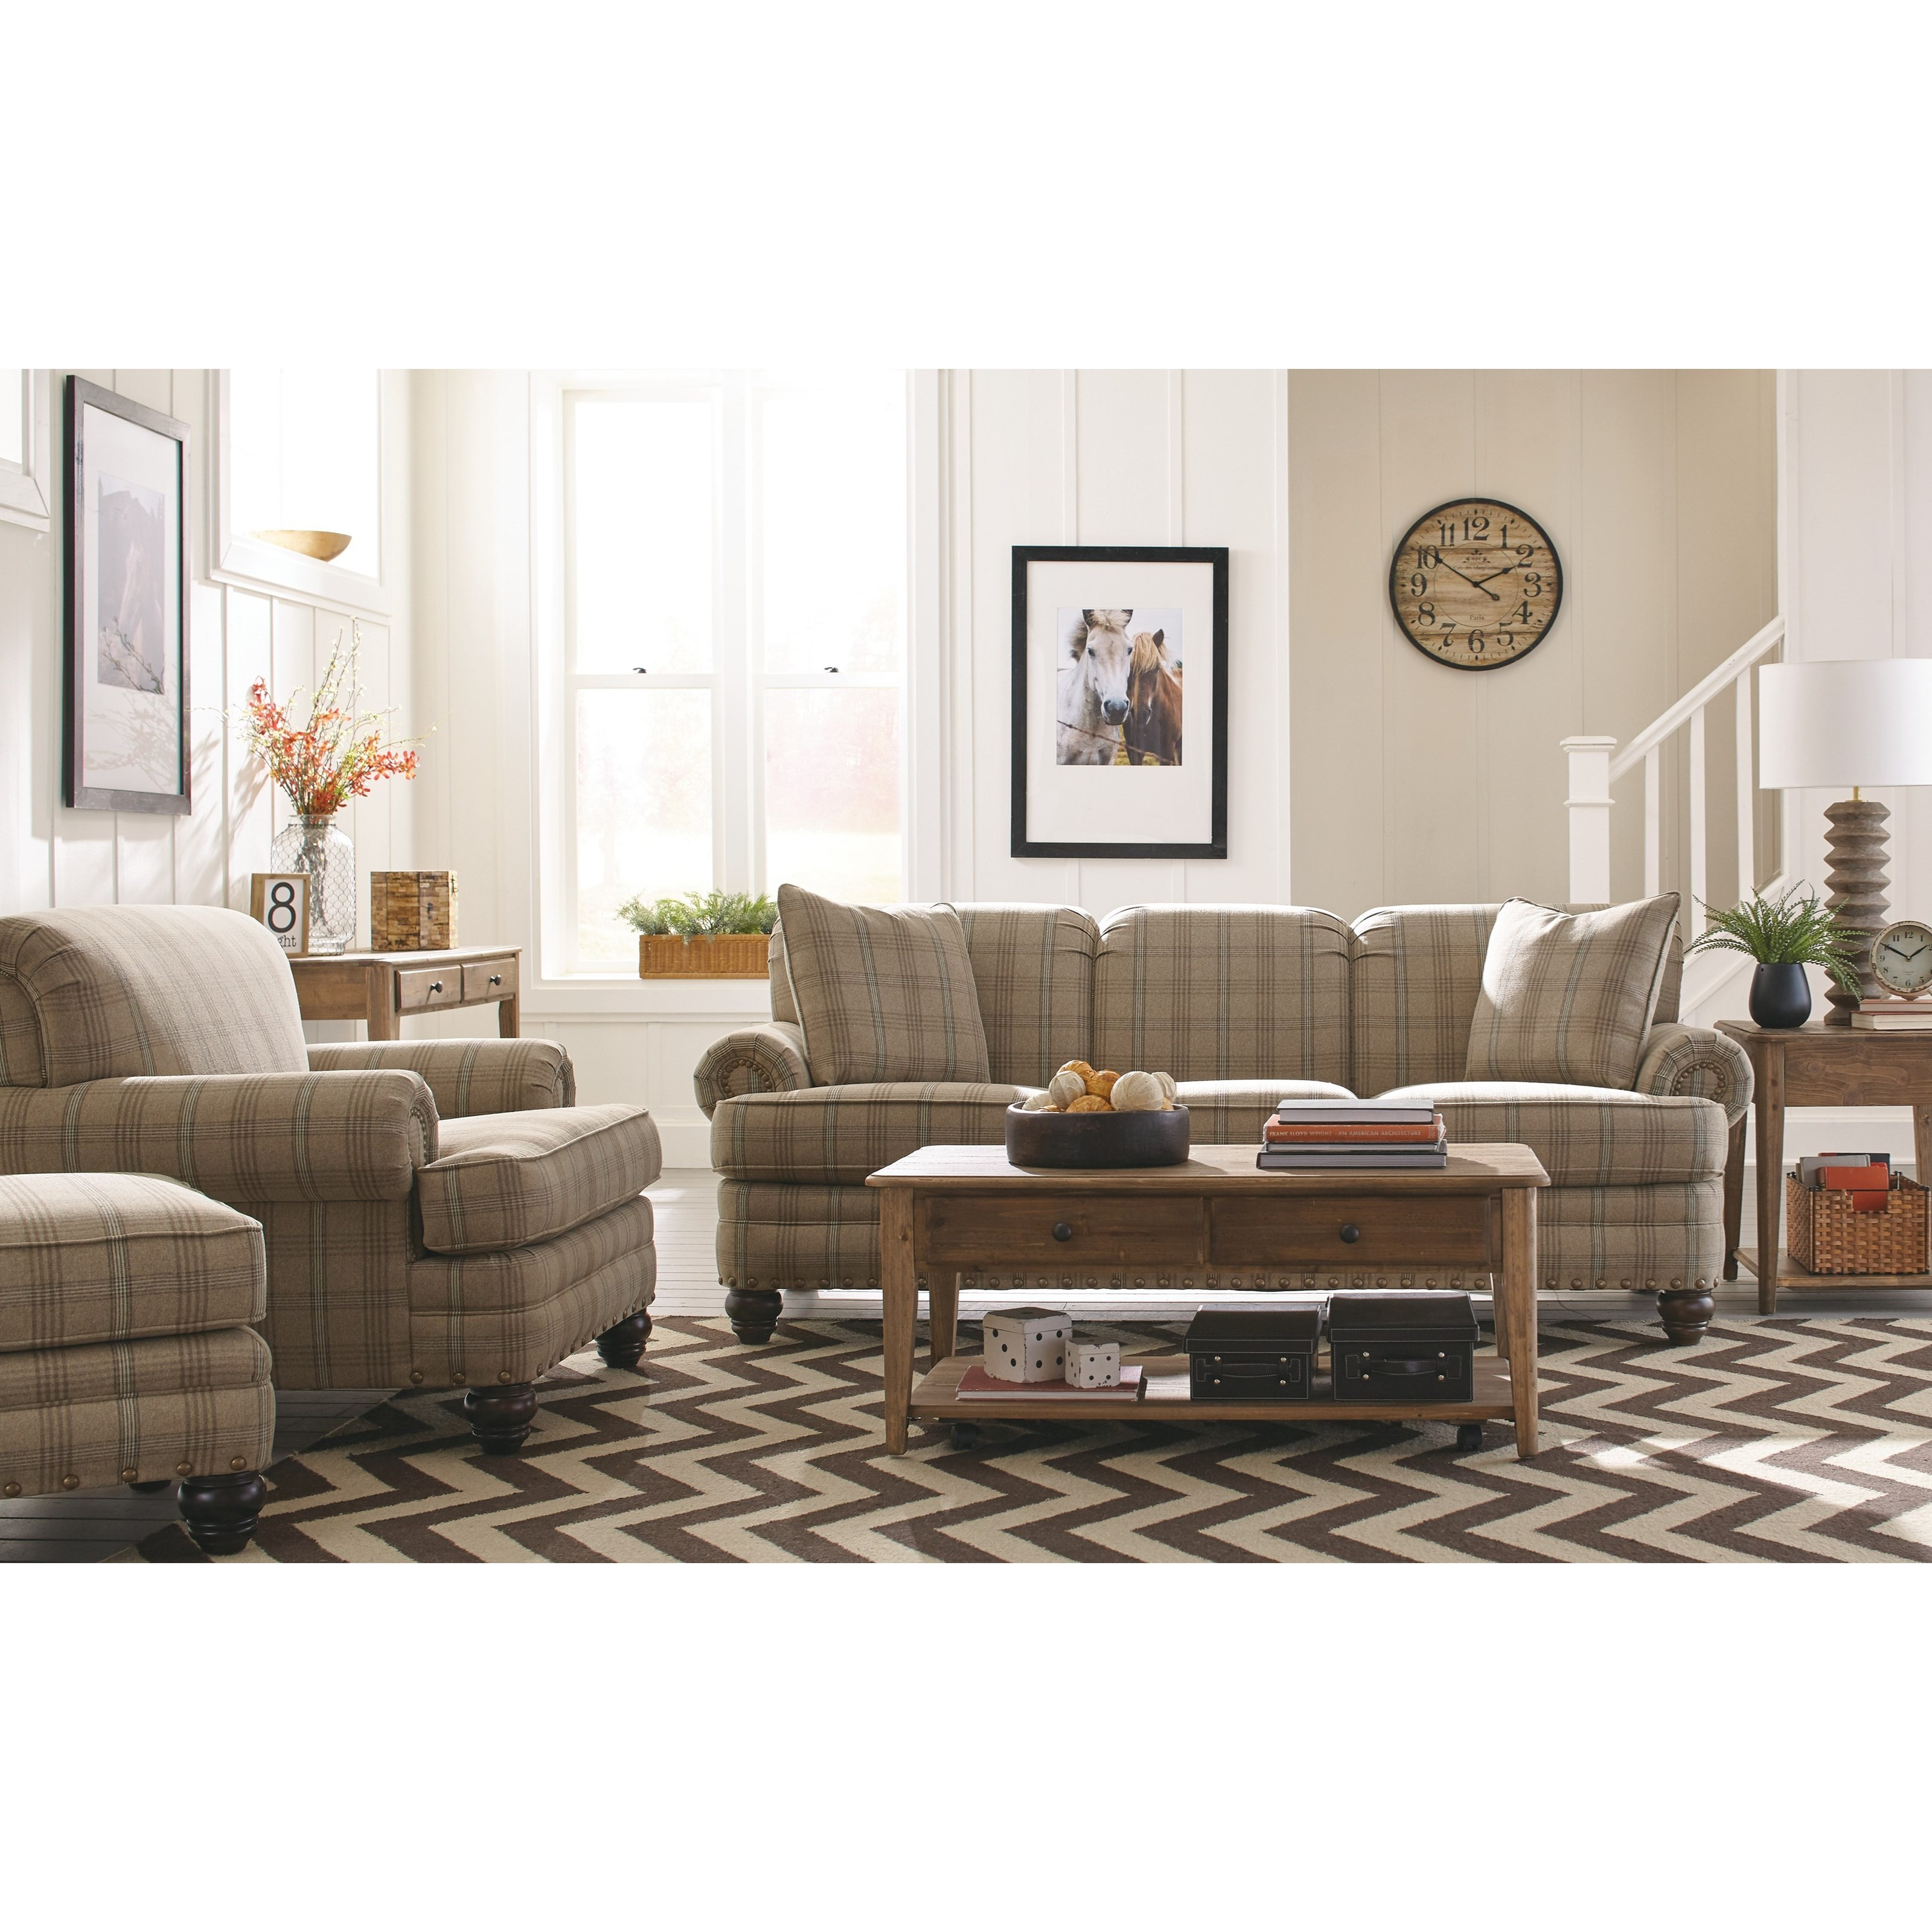 7281 Living Room Group by Craftmaster at Bullard Furniture